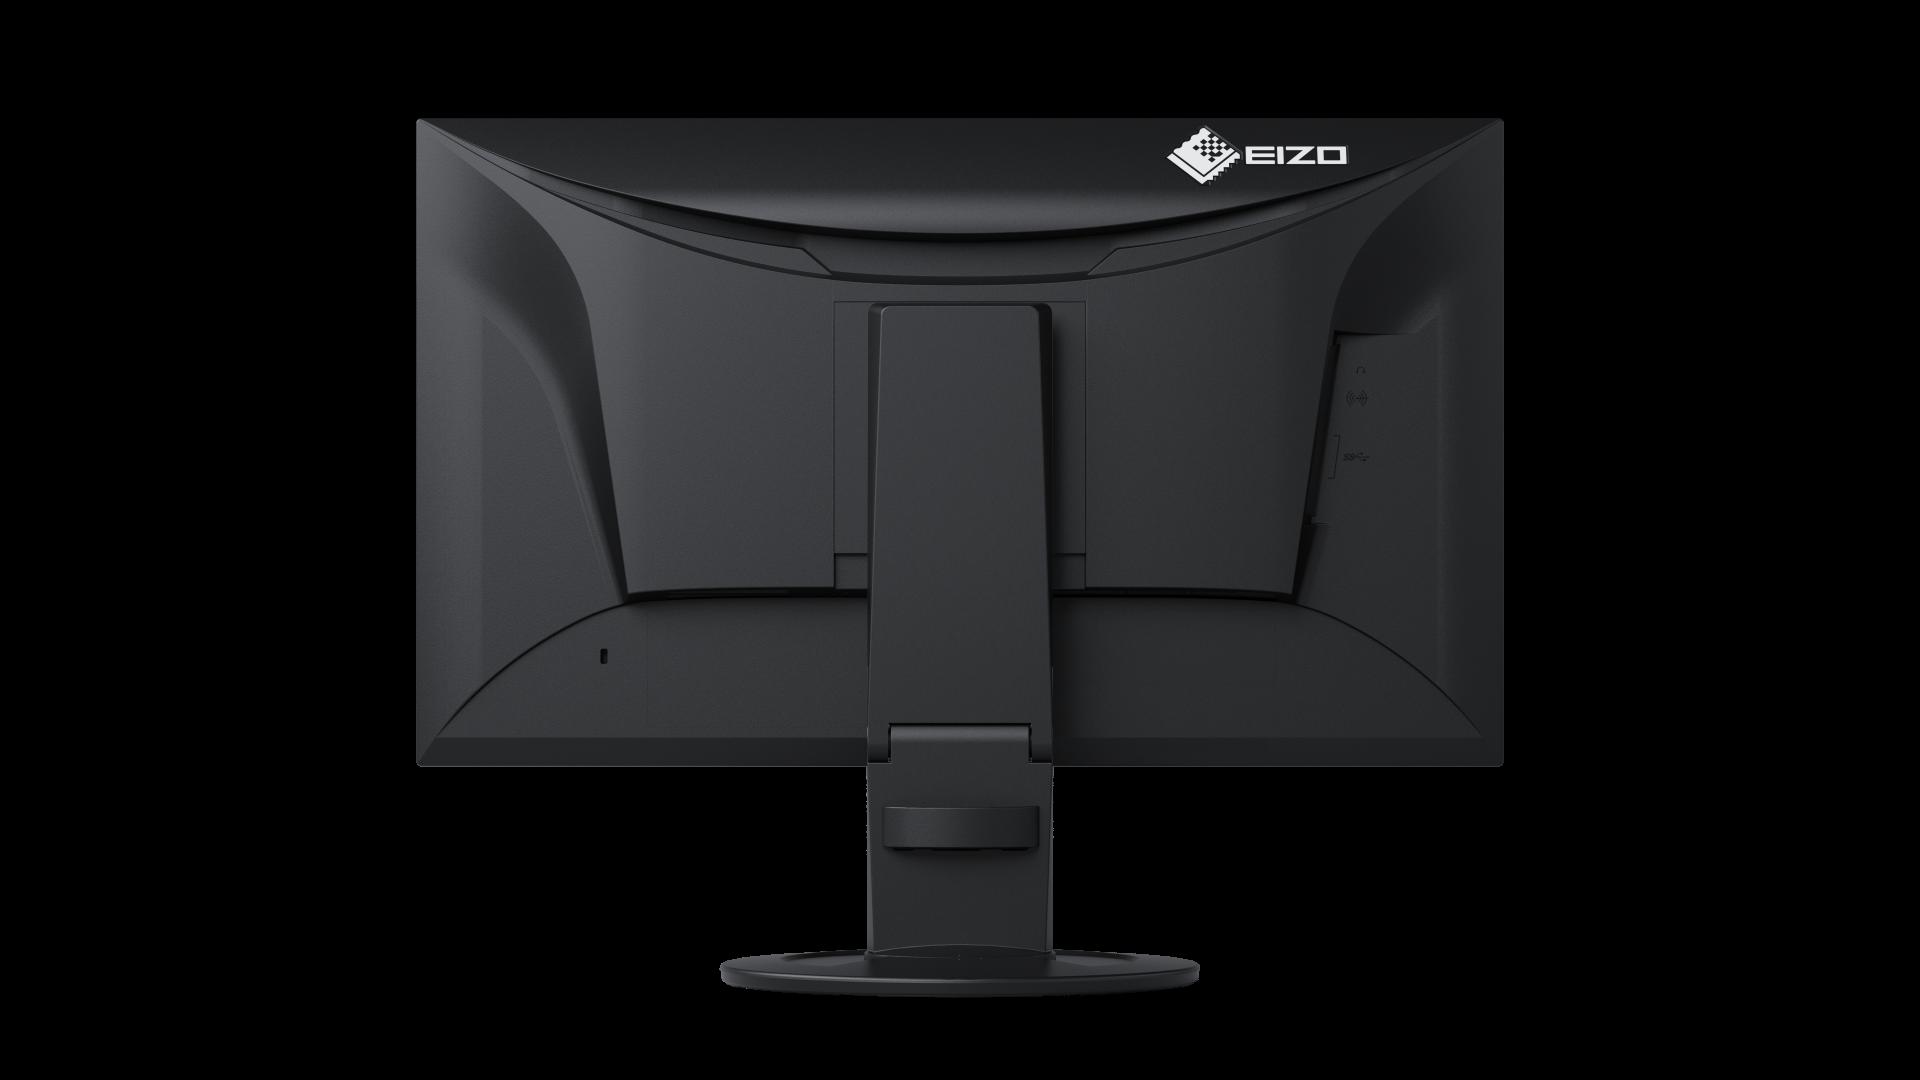 Eizo Eizo Flexscan EV2460-BK